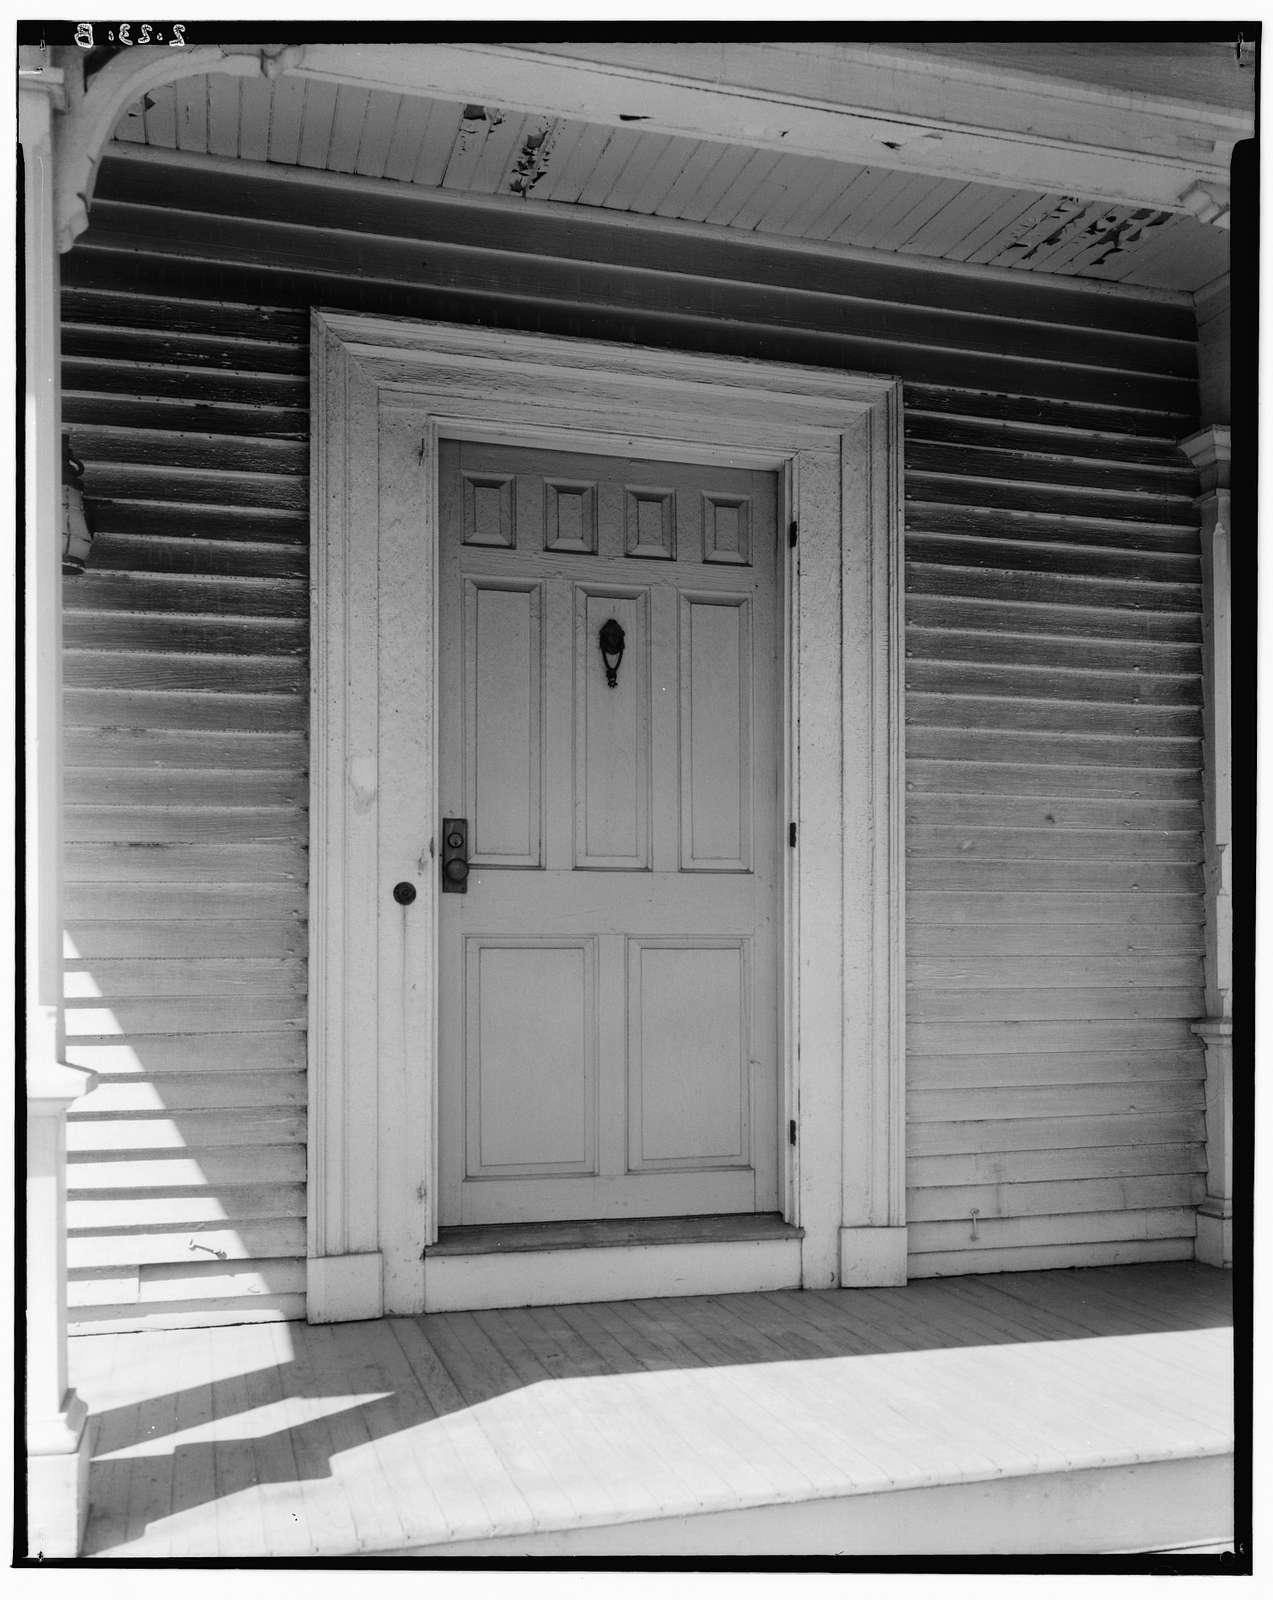 Arrowhead, 780 Holmes Road, Pittsfield, Berkshire County, MA